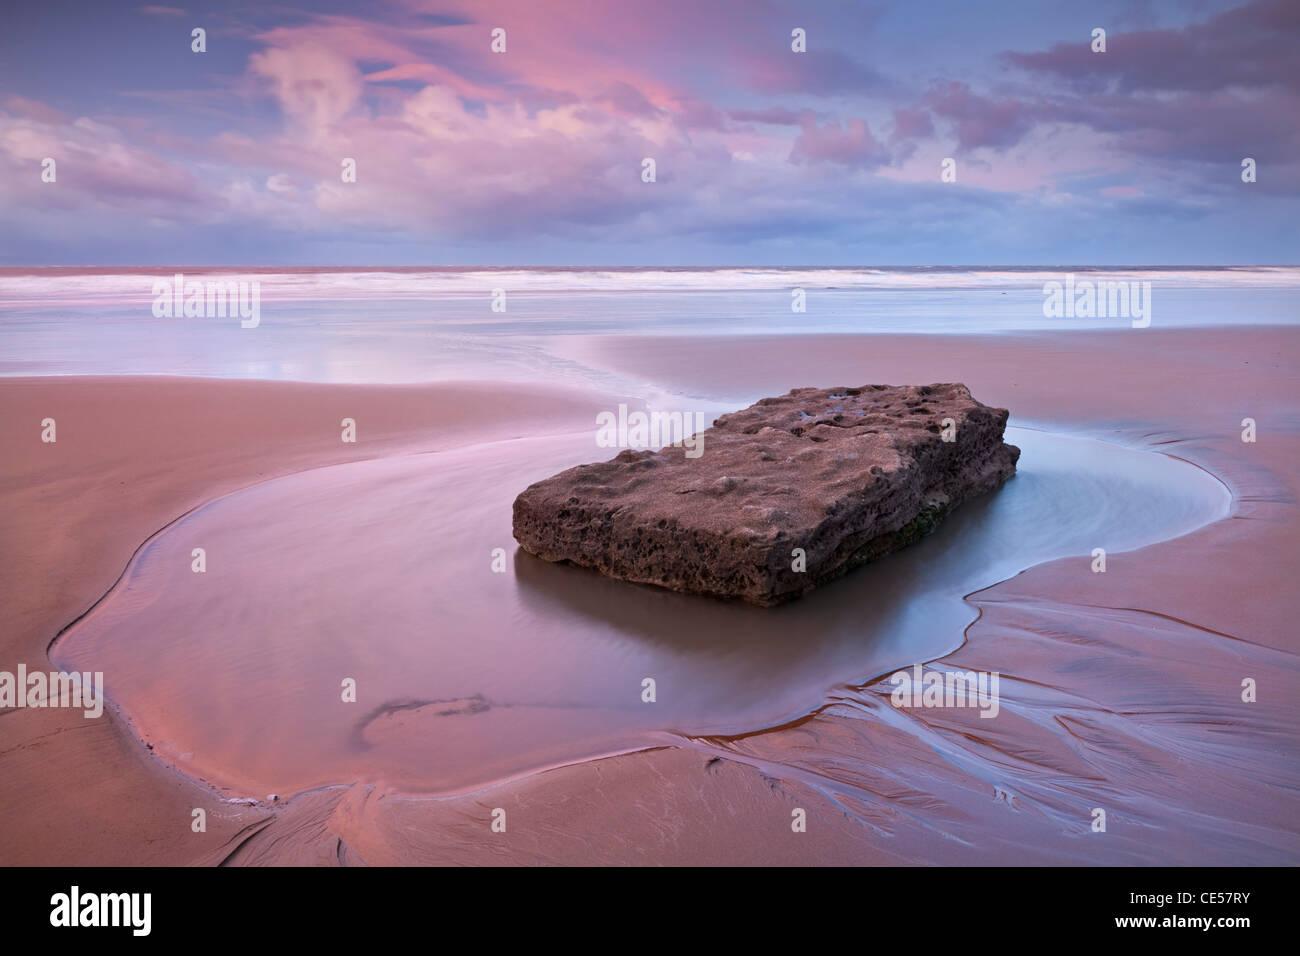 Pristine sandy beach at dawn, Southerndown, Glamorgan Heritage Coast, Wales, UK. Winter (December) 2011. - Stock Image